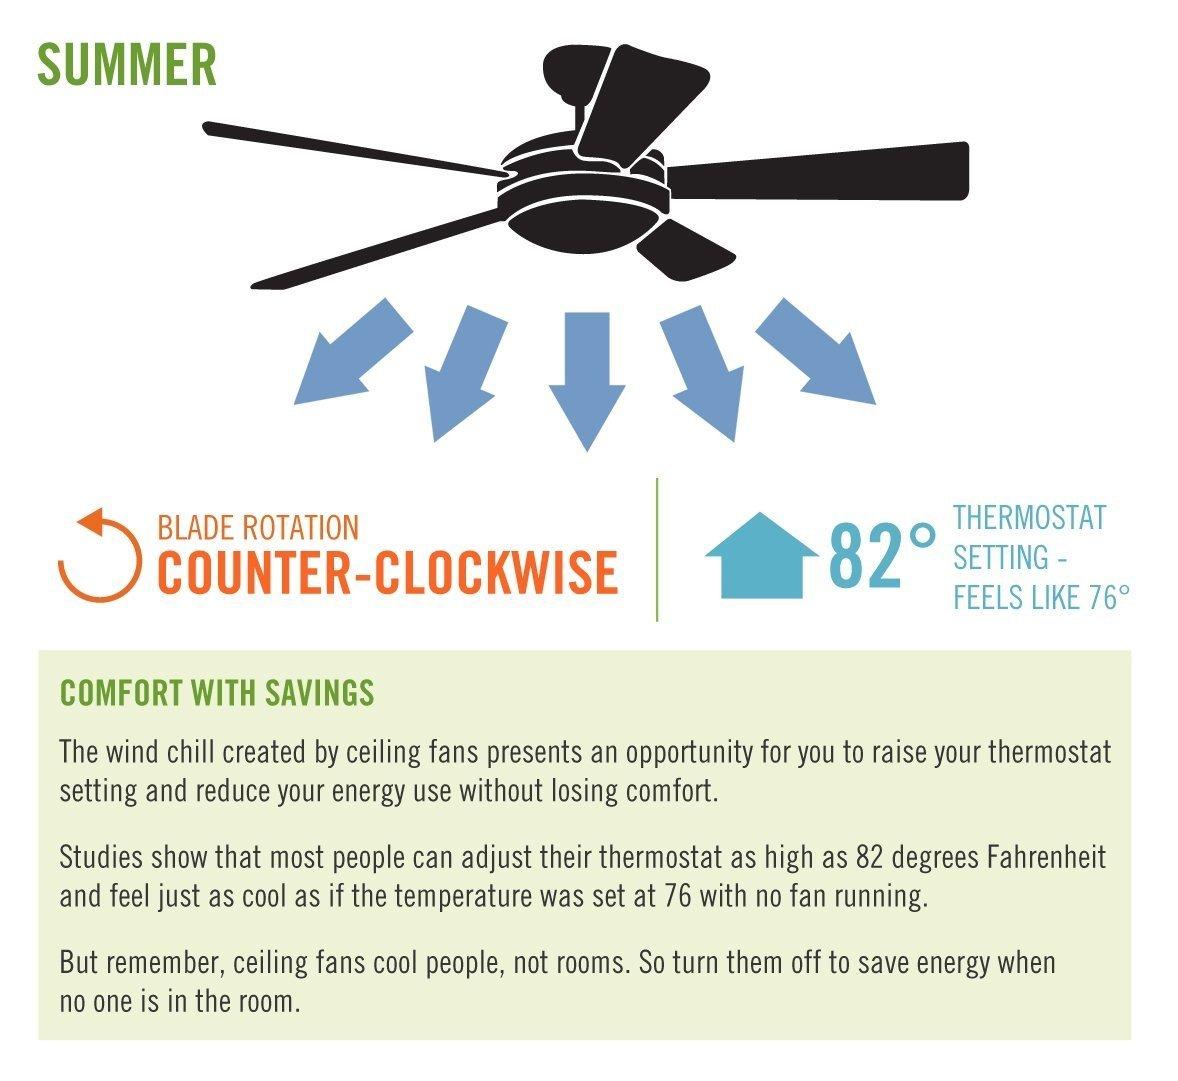 Hunter Thermostat Wiring Diagram Nilzanet – Duo Therm Thermostat Wiring Diagram